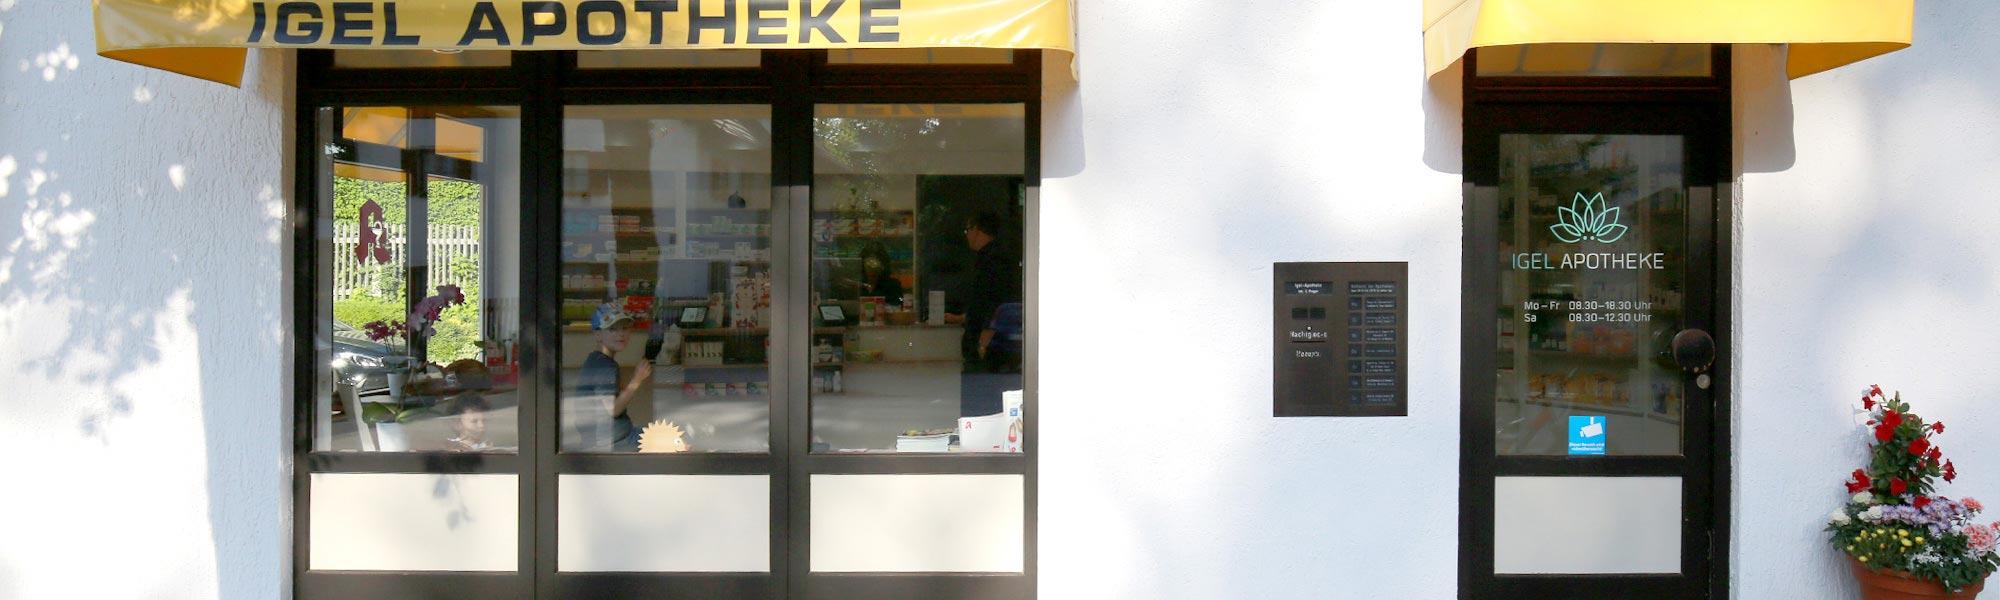 Igel Apotheke | Eingang